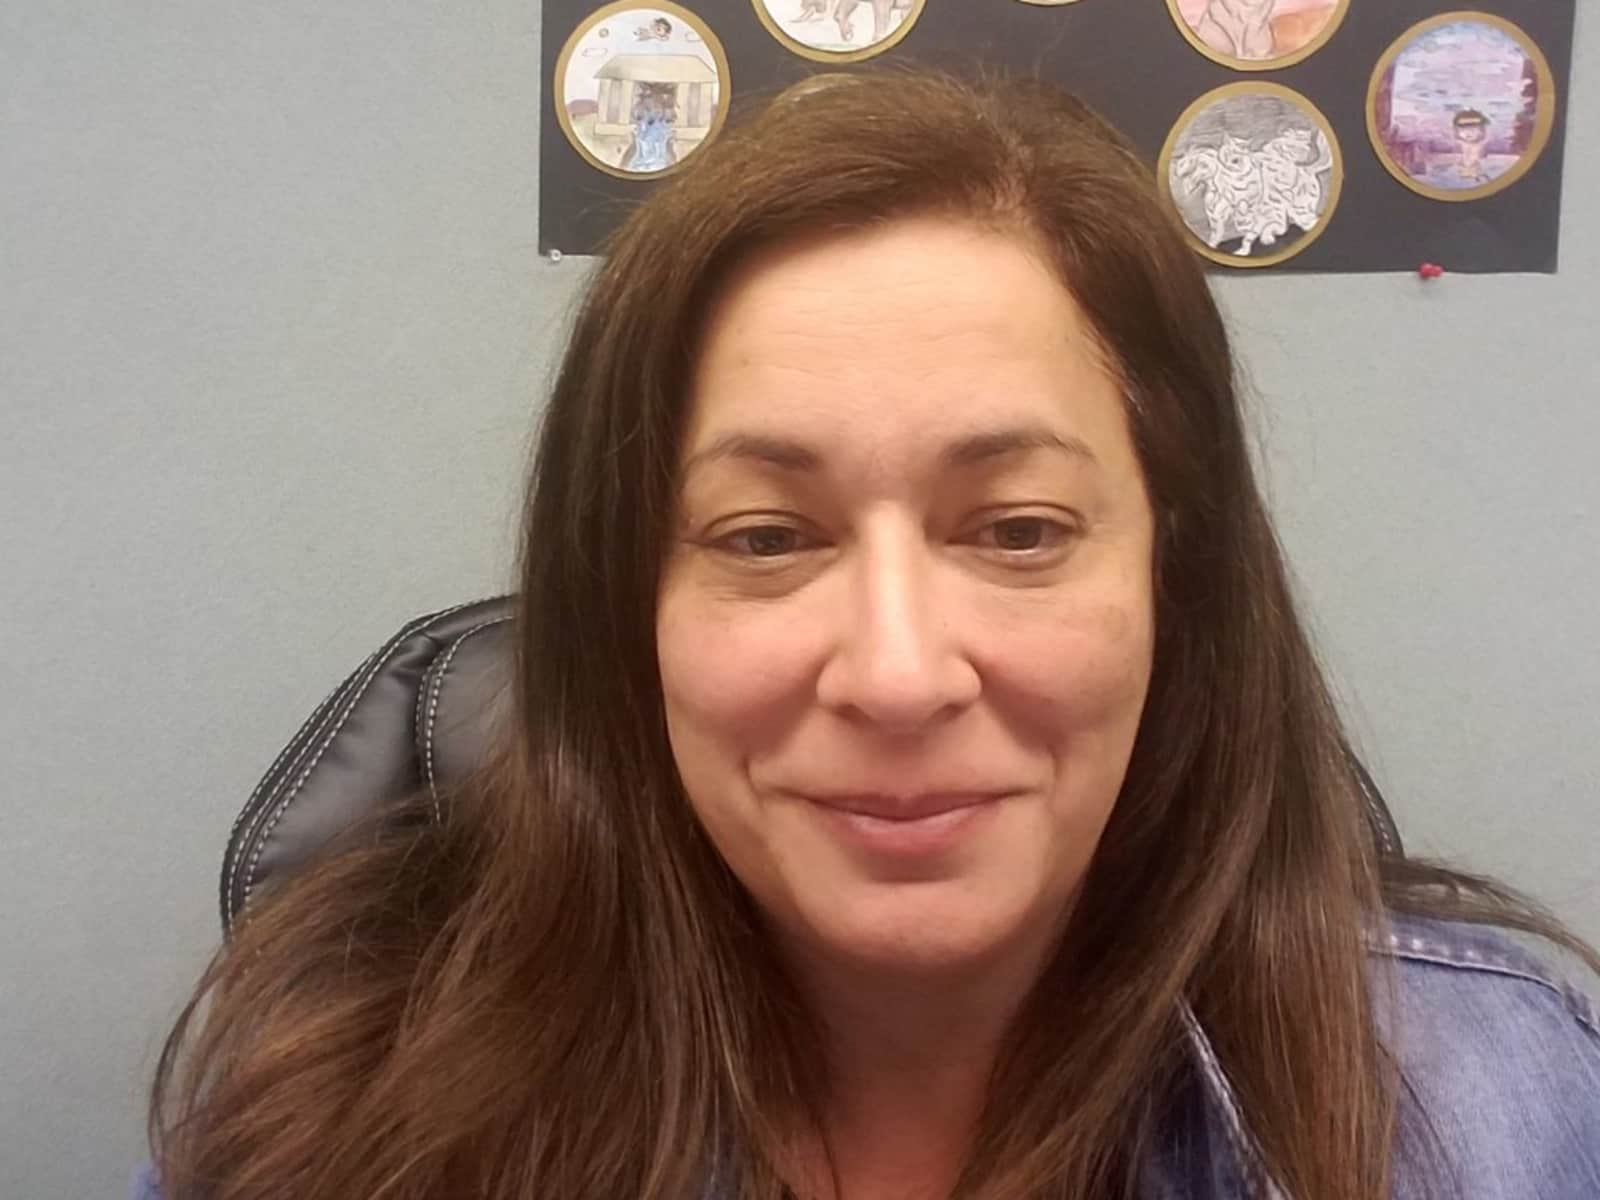 Stephanie from Rancho Santa Margarita, California, United States